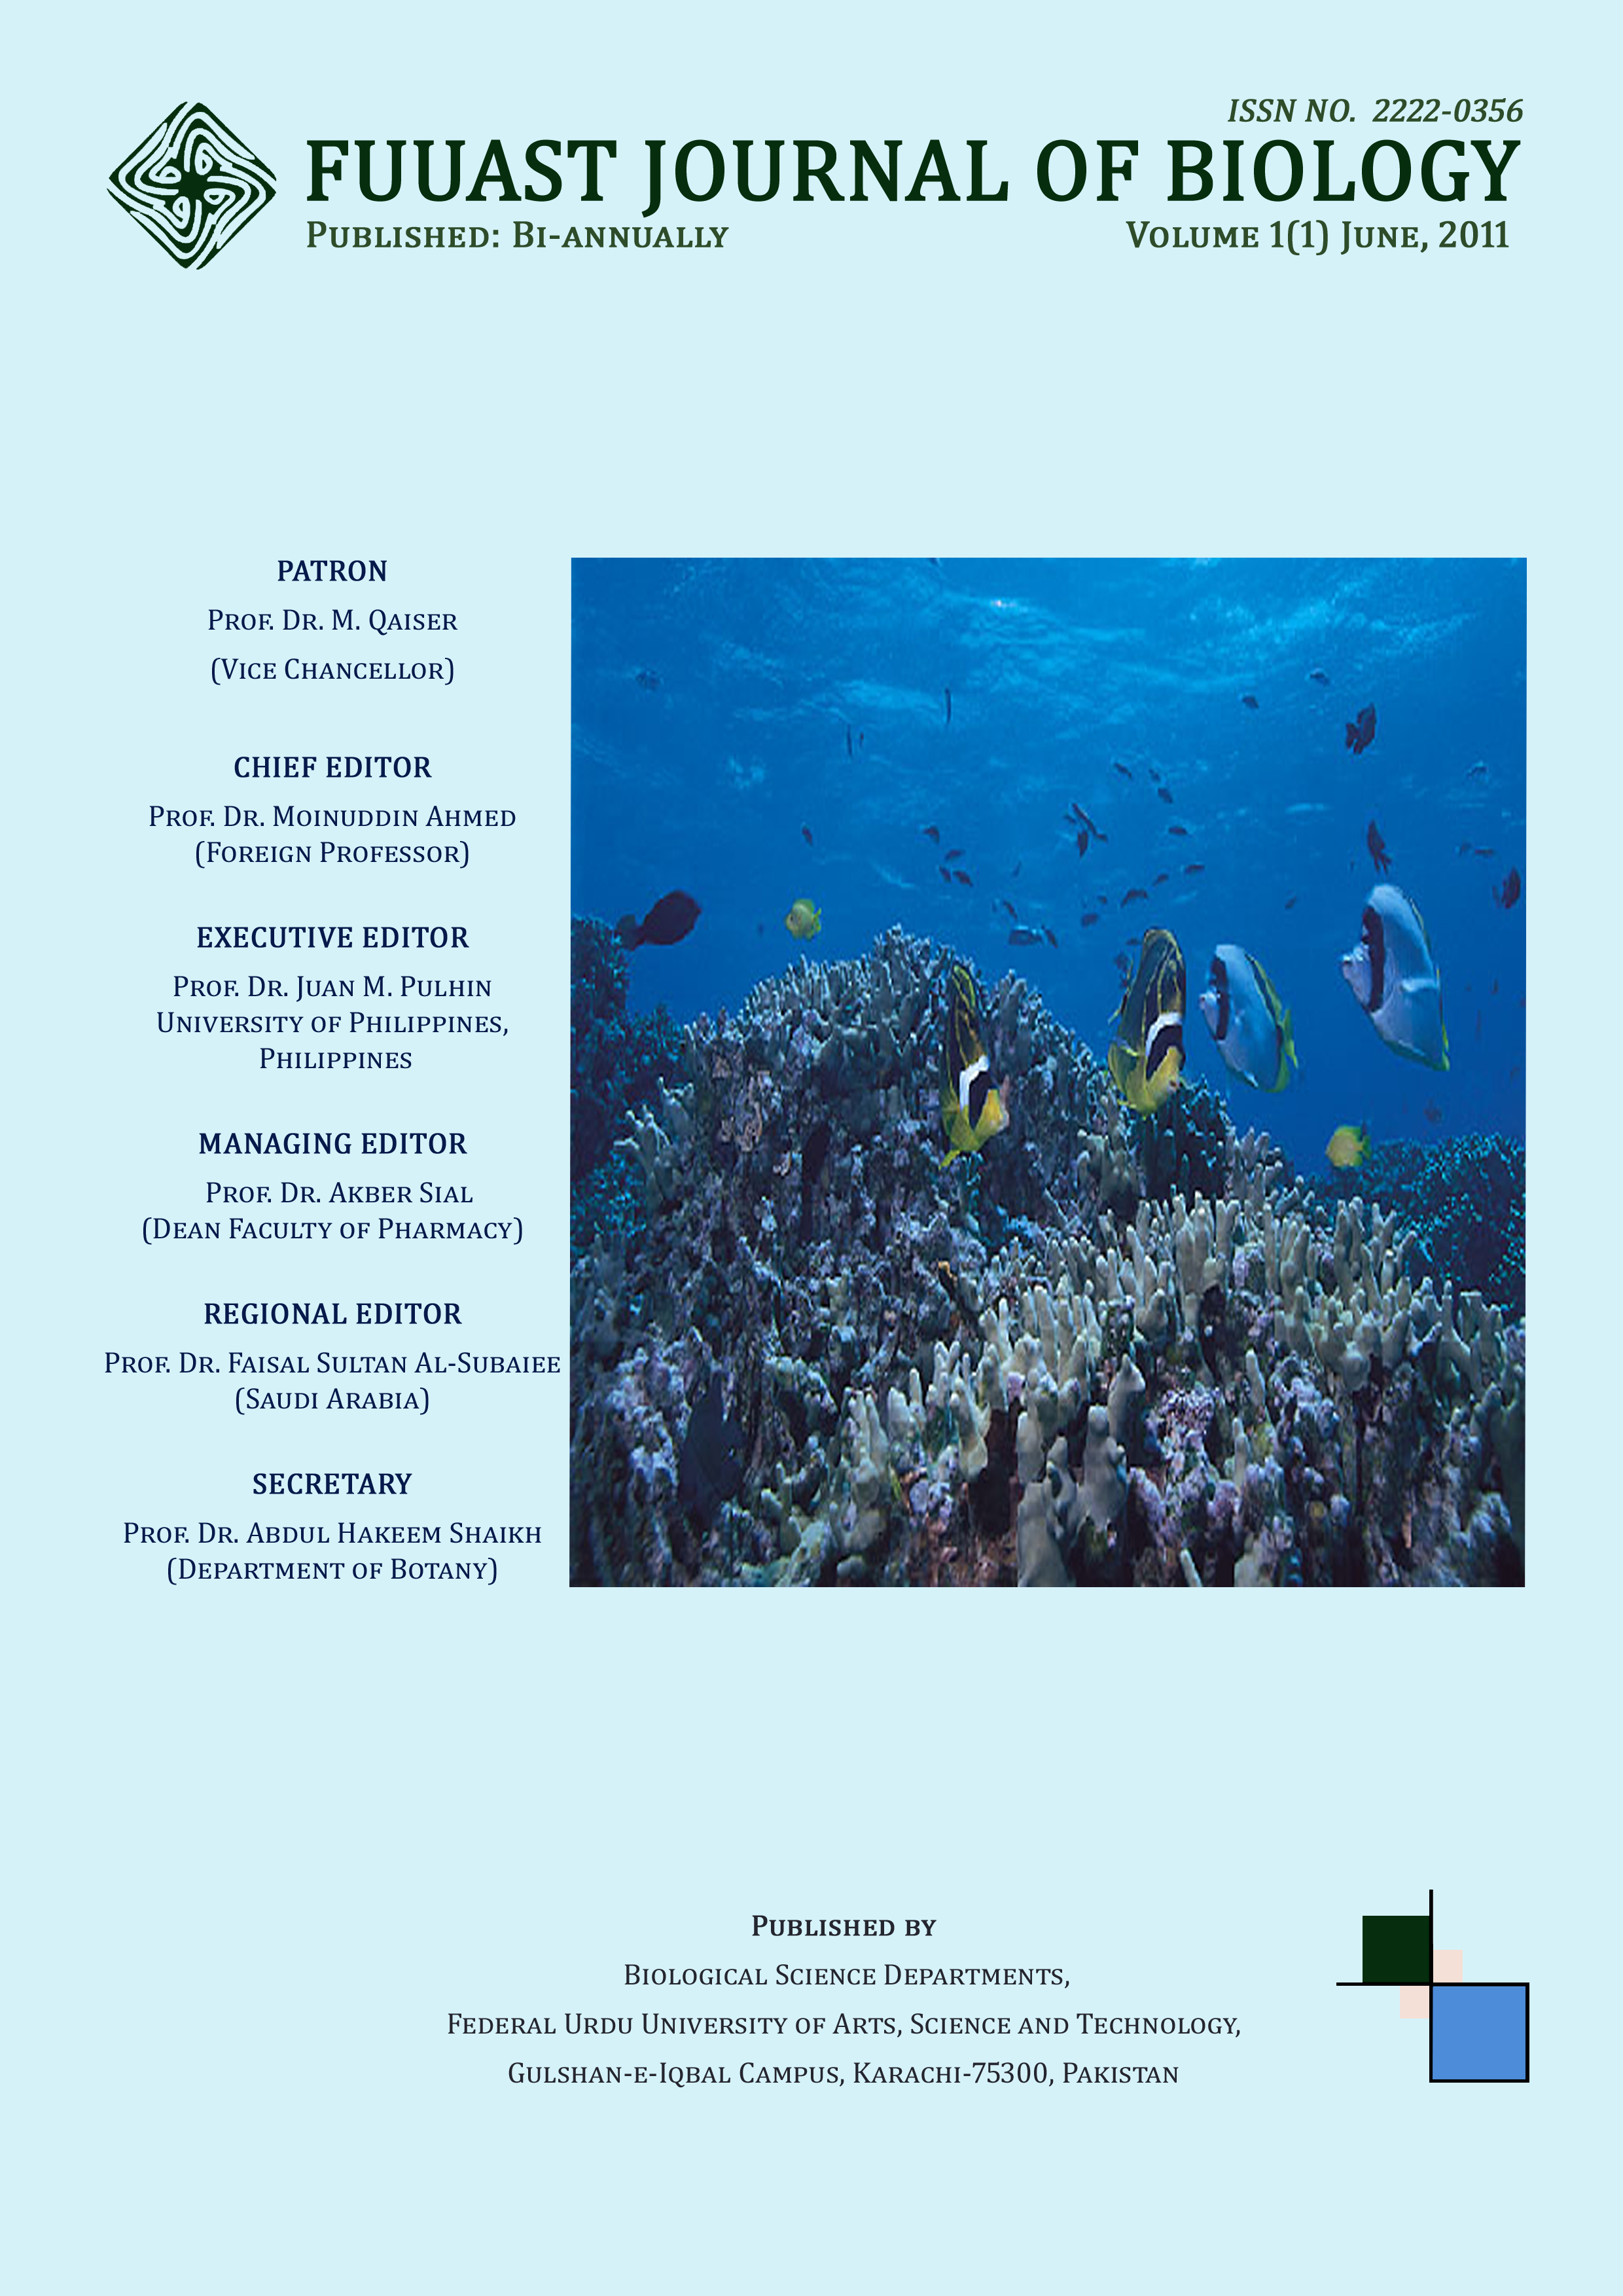 View Vol. 1 No. 1 June (2011): Fuuast Journal of Biology